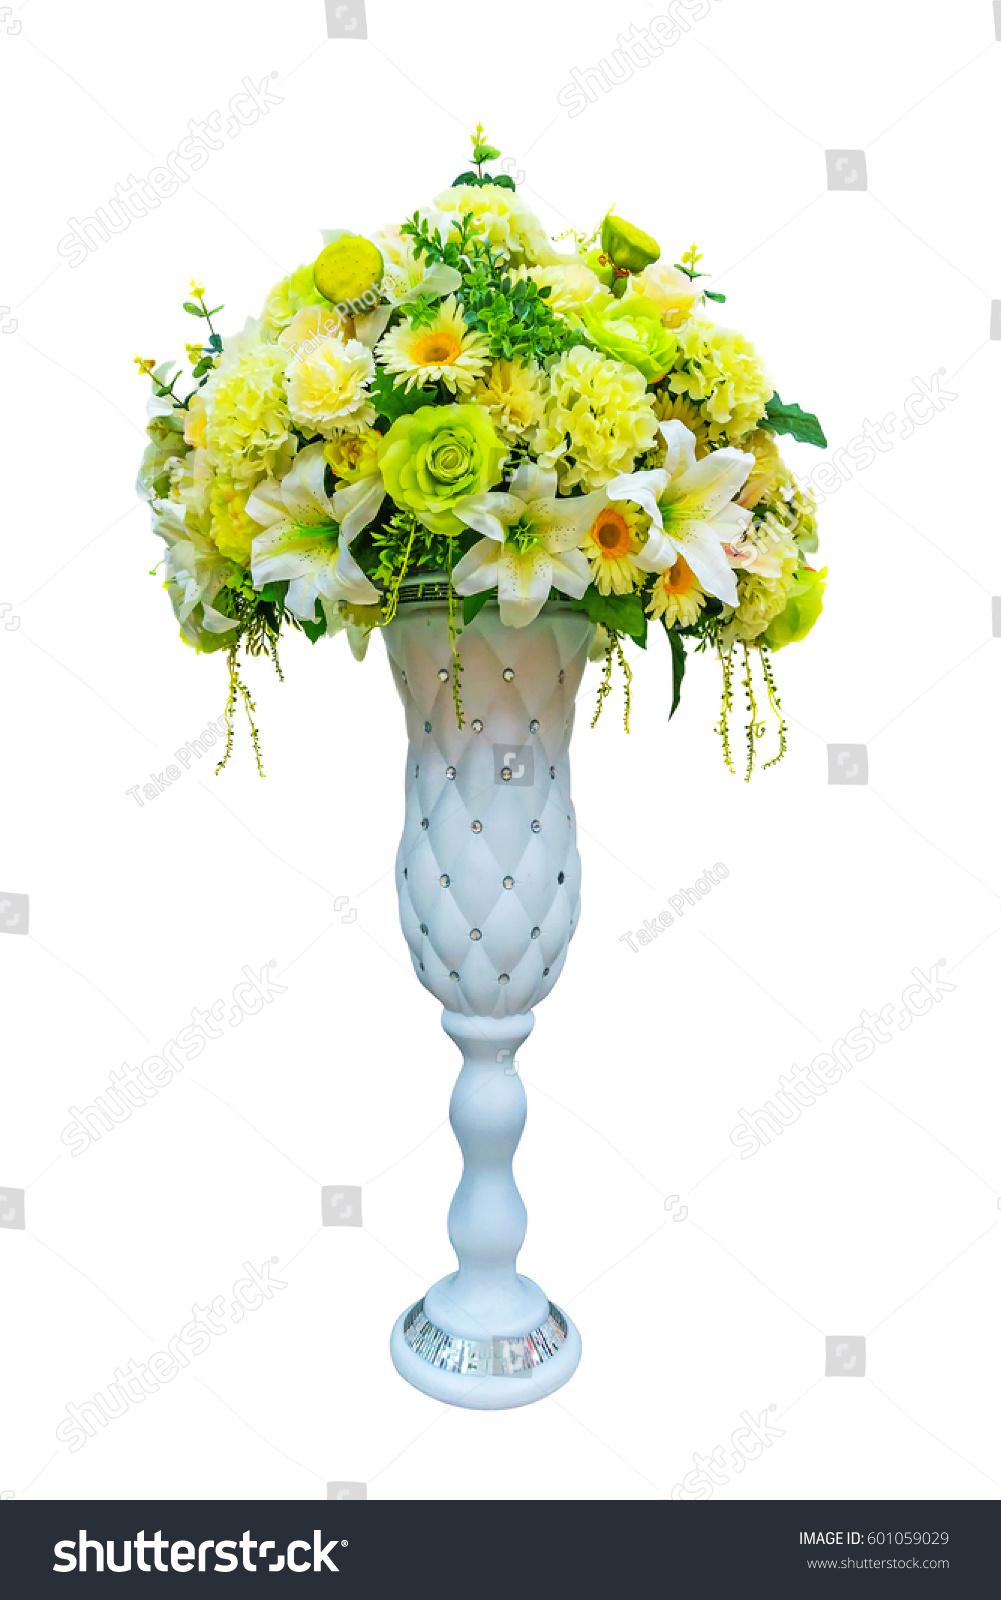 Decoration Artificial Plastic Flower Big Vase Stock Photo Edit Now 601059029